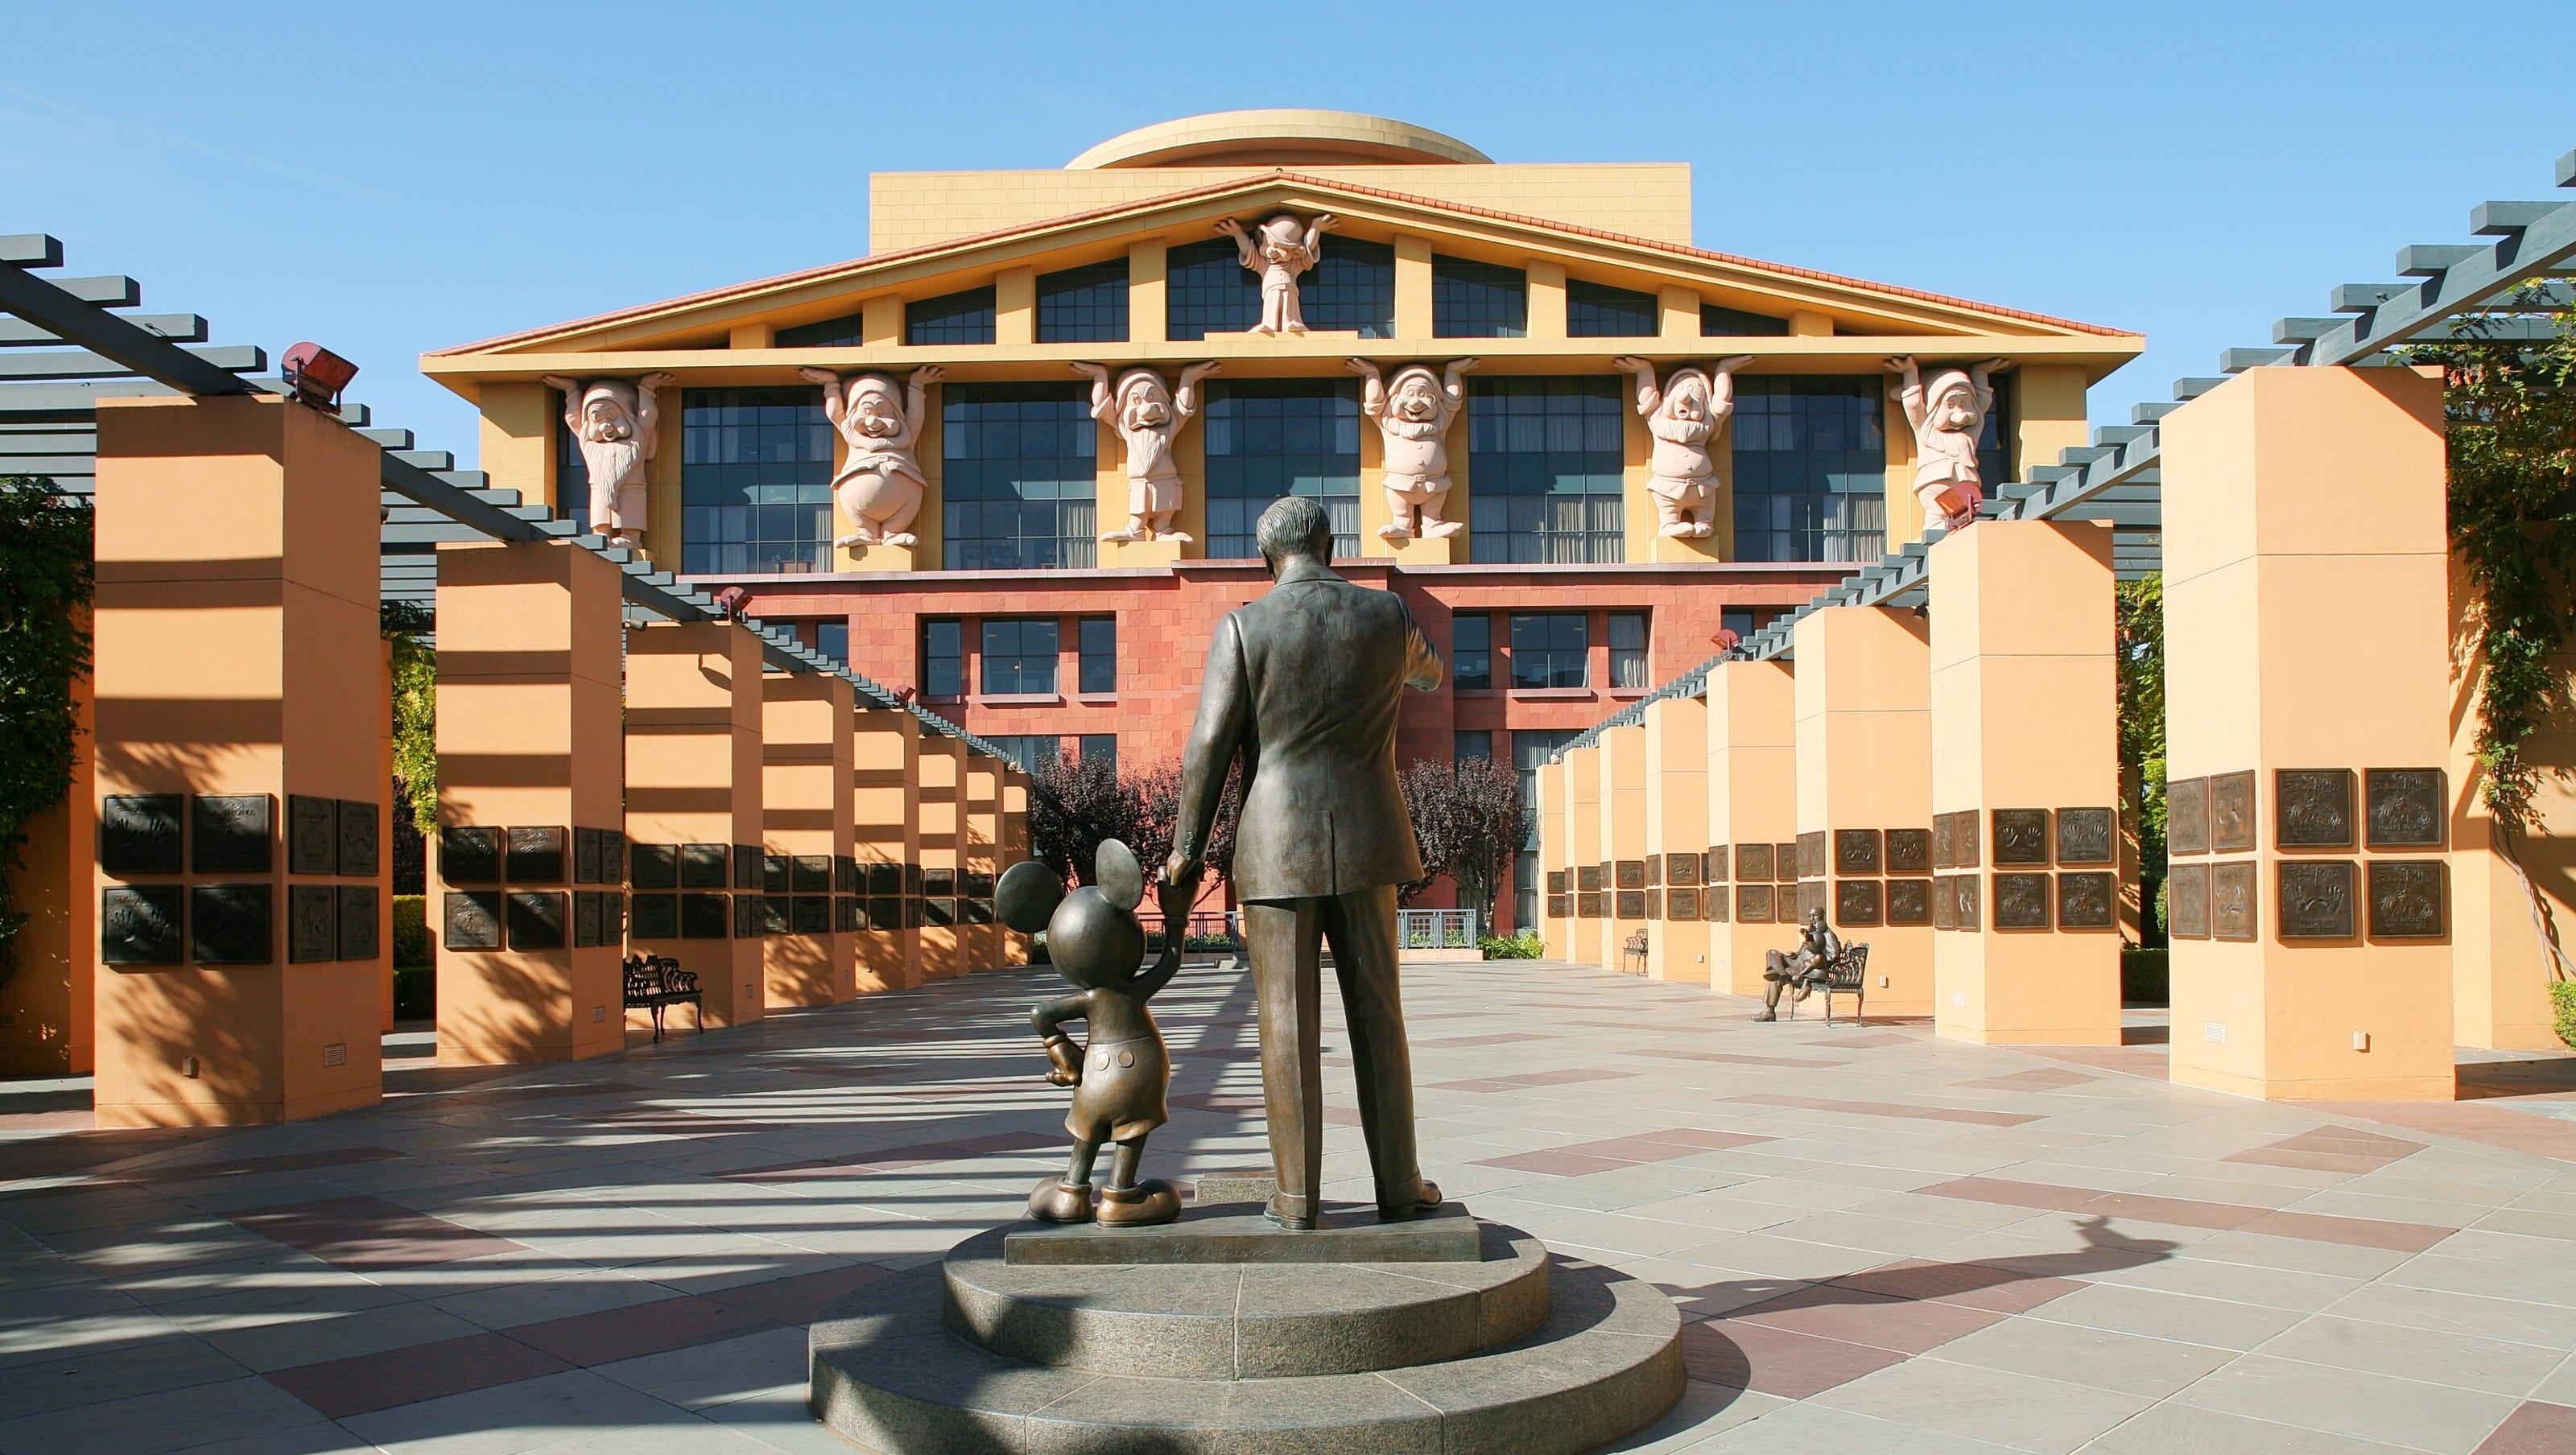 Walt Disney Studios Take A Tour Of The Working Lot